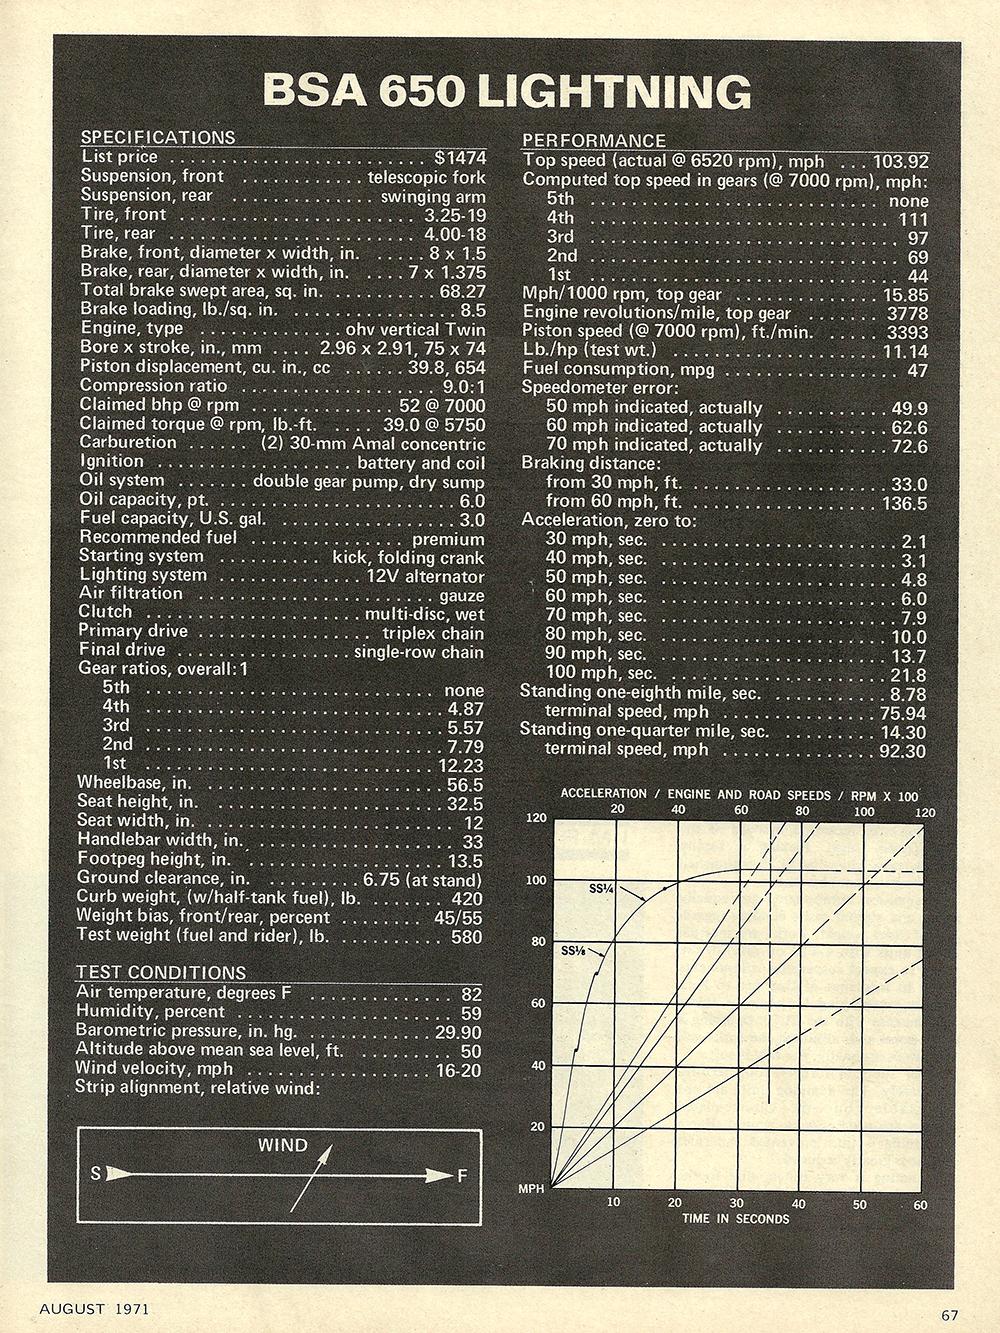 1971 BSA 650 Lightning road test 04.jpg